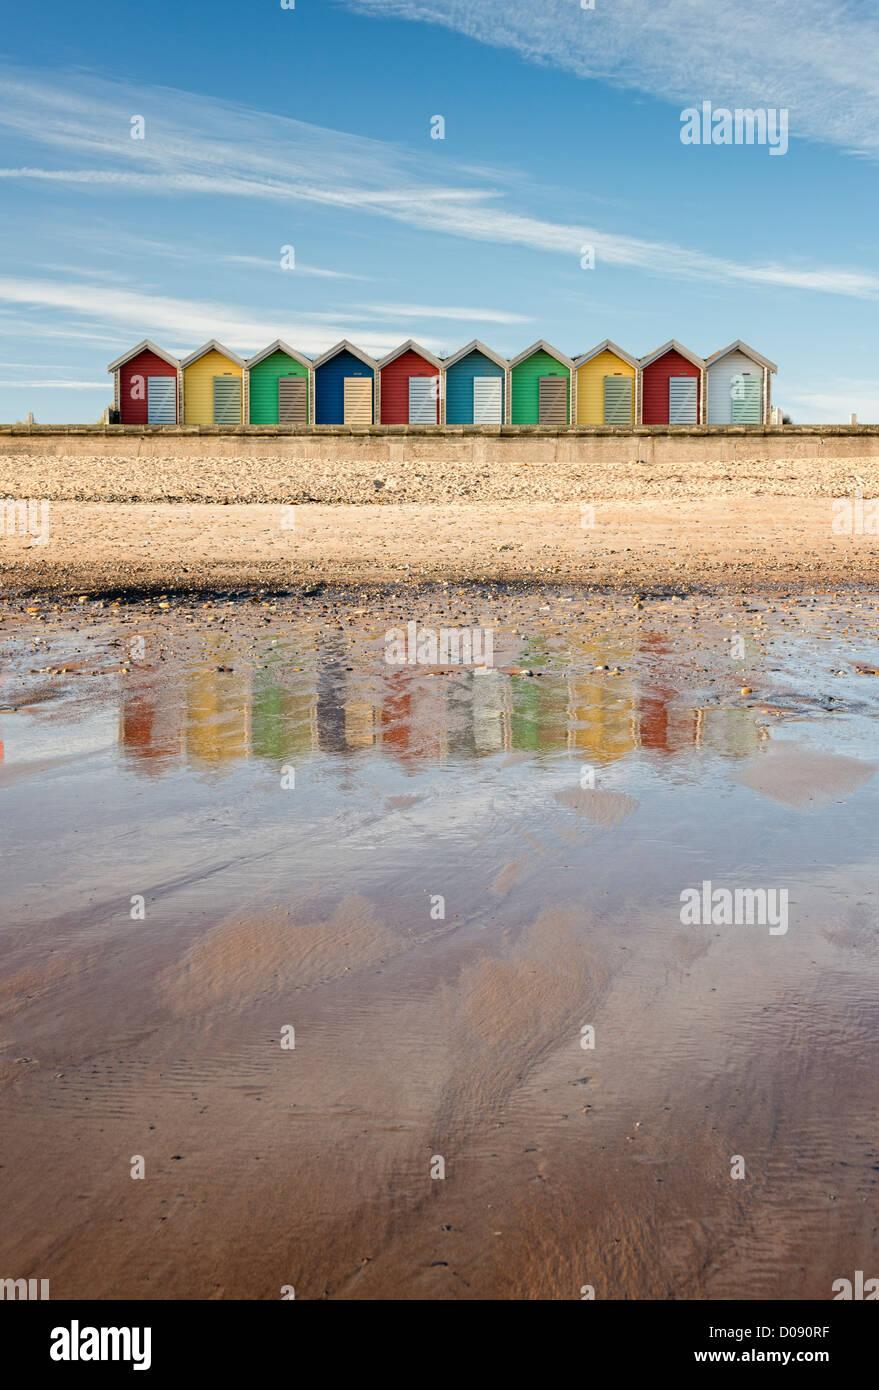 Beach Huts at Blyth in Northumberland - Stock Image